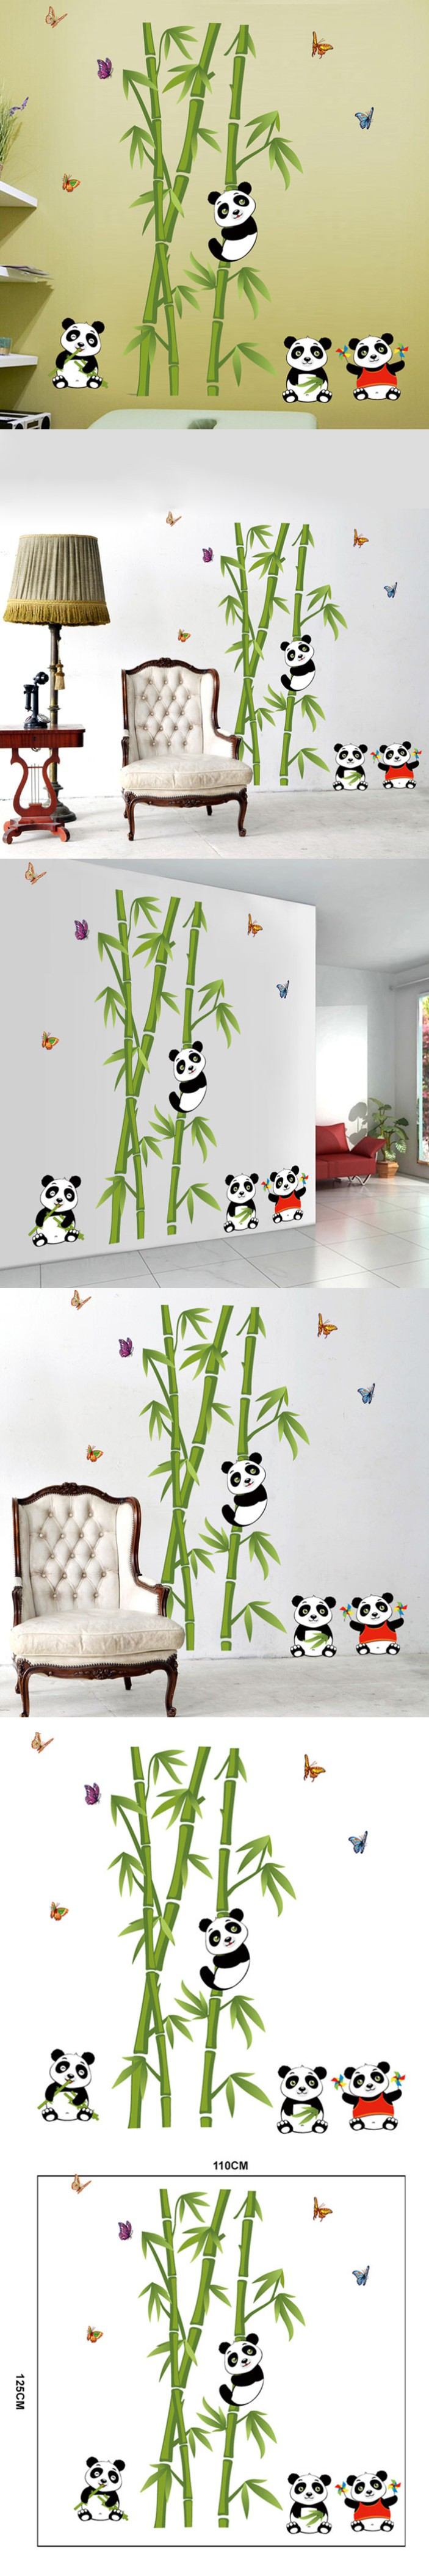 SPLENDID Home Decor Mural Vinyl Wall Sticker Removable Cute Panda Eating Bamboo Room Wallpaper Decorative Art Decals